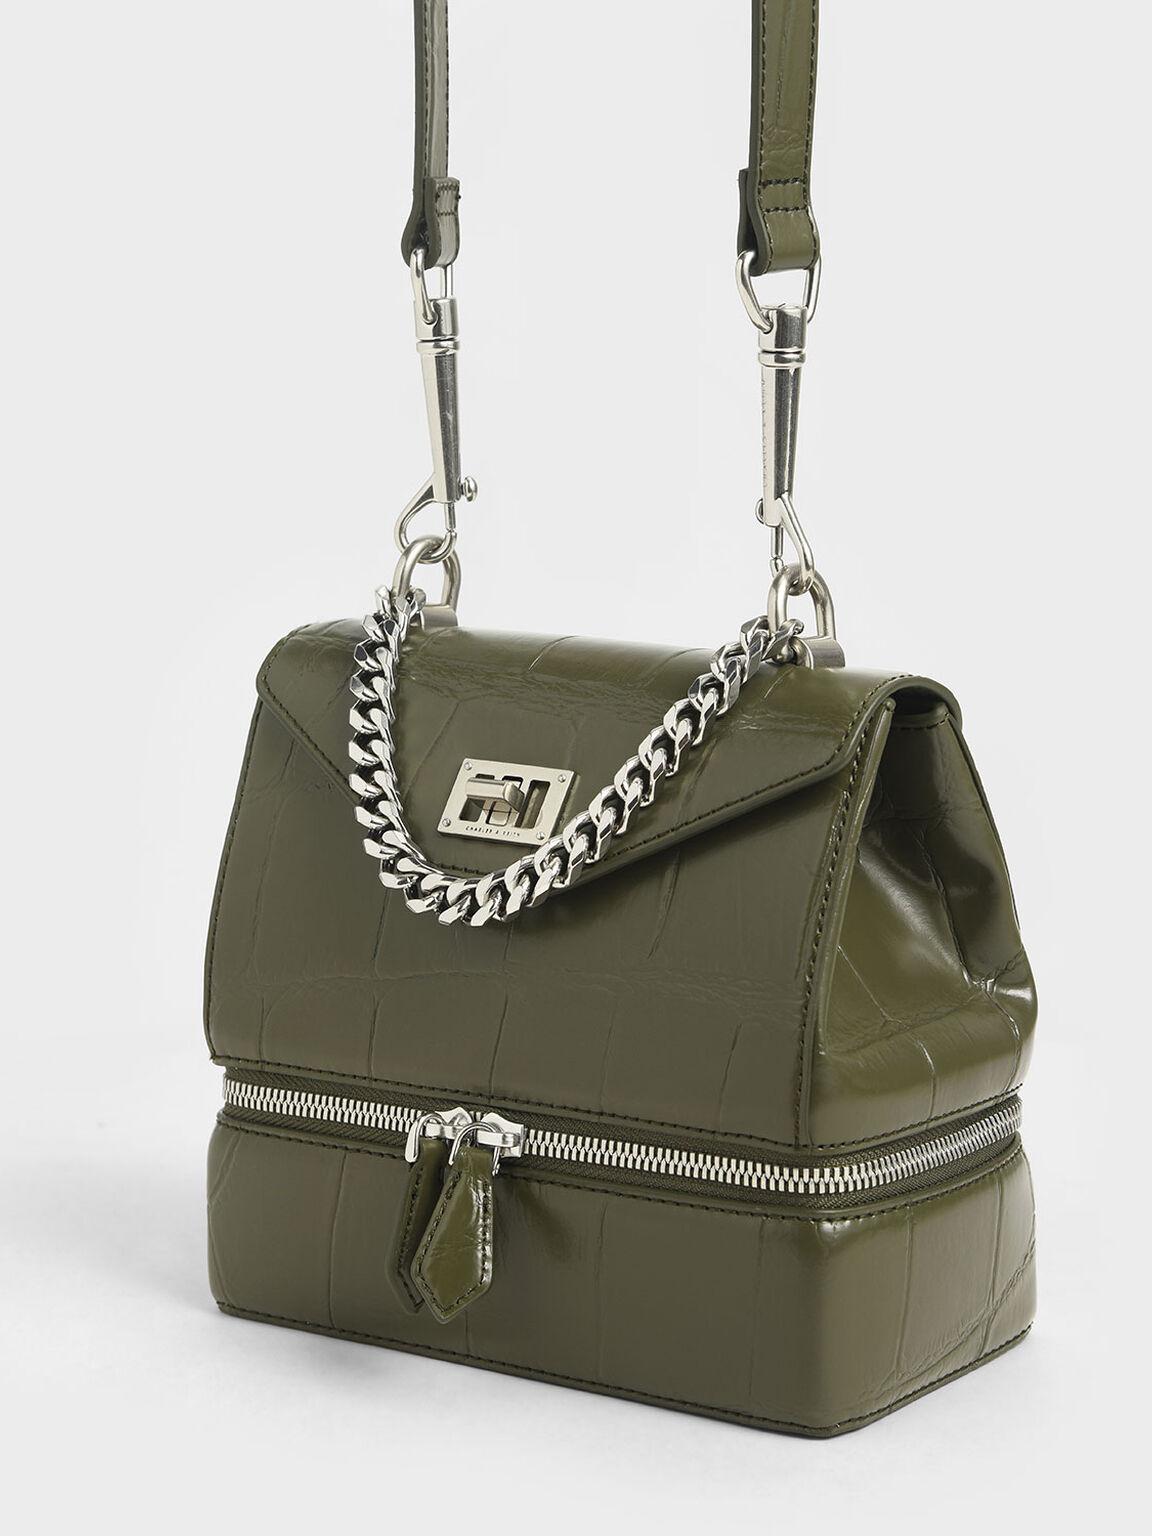 Croc-Effect Two-Way Zip Handbag, Olive, hi-res